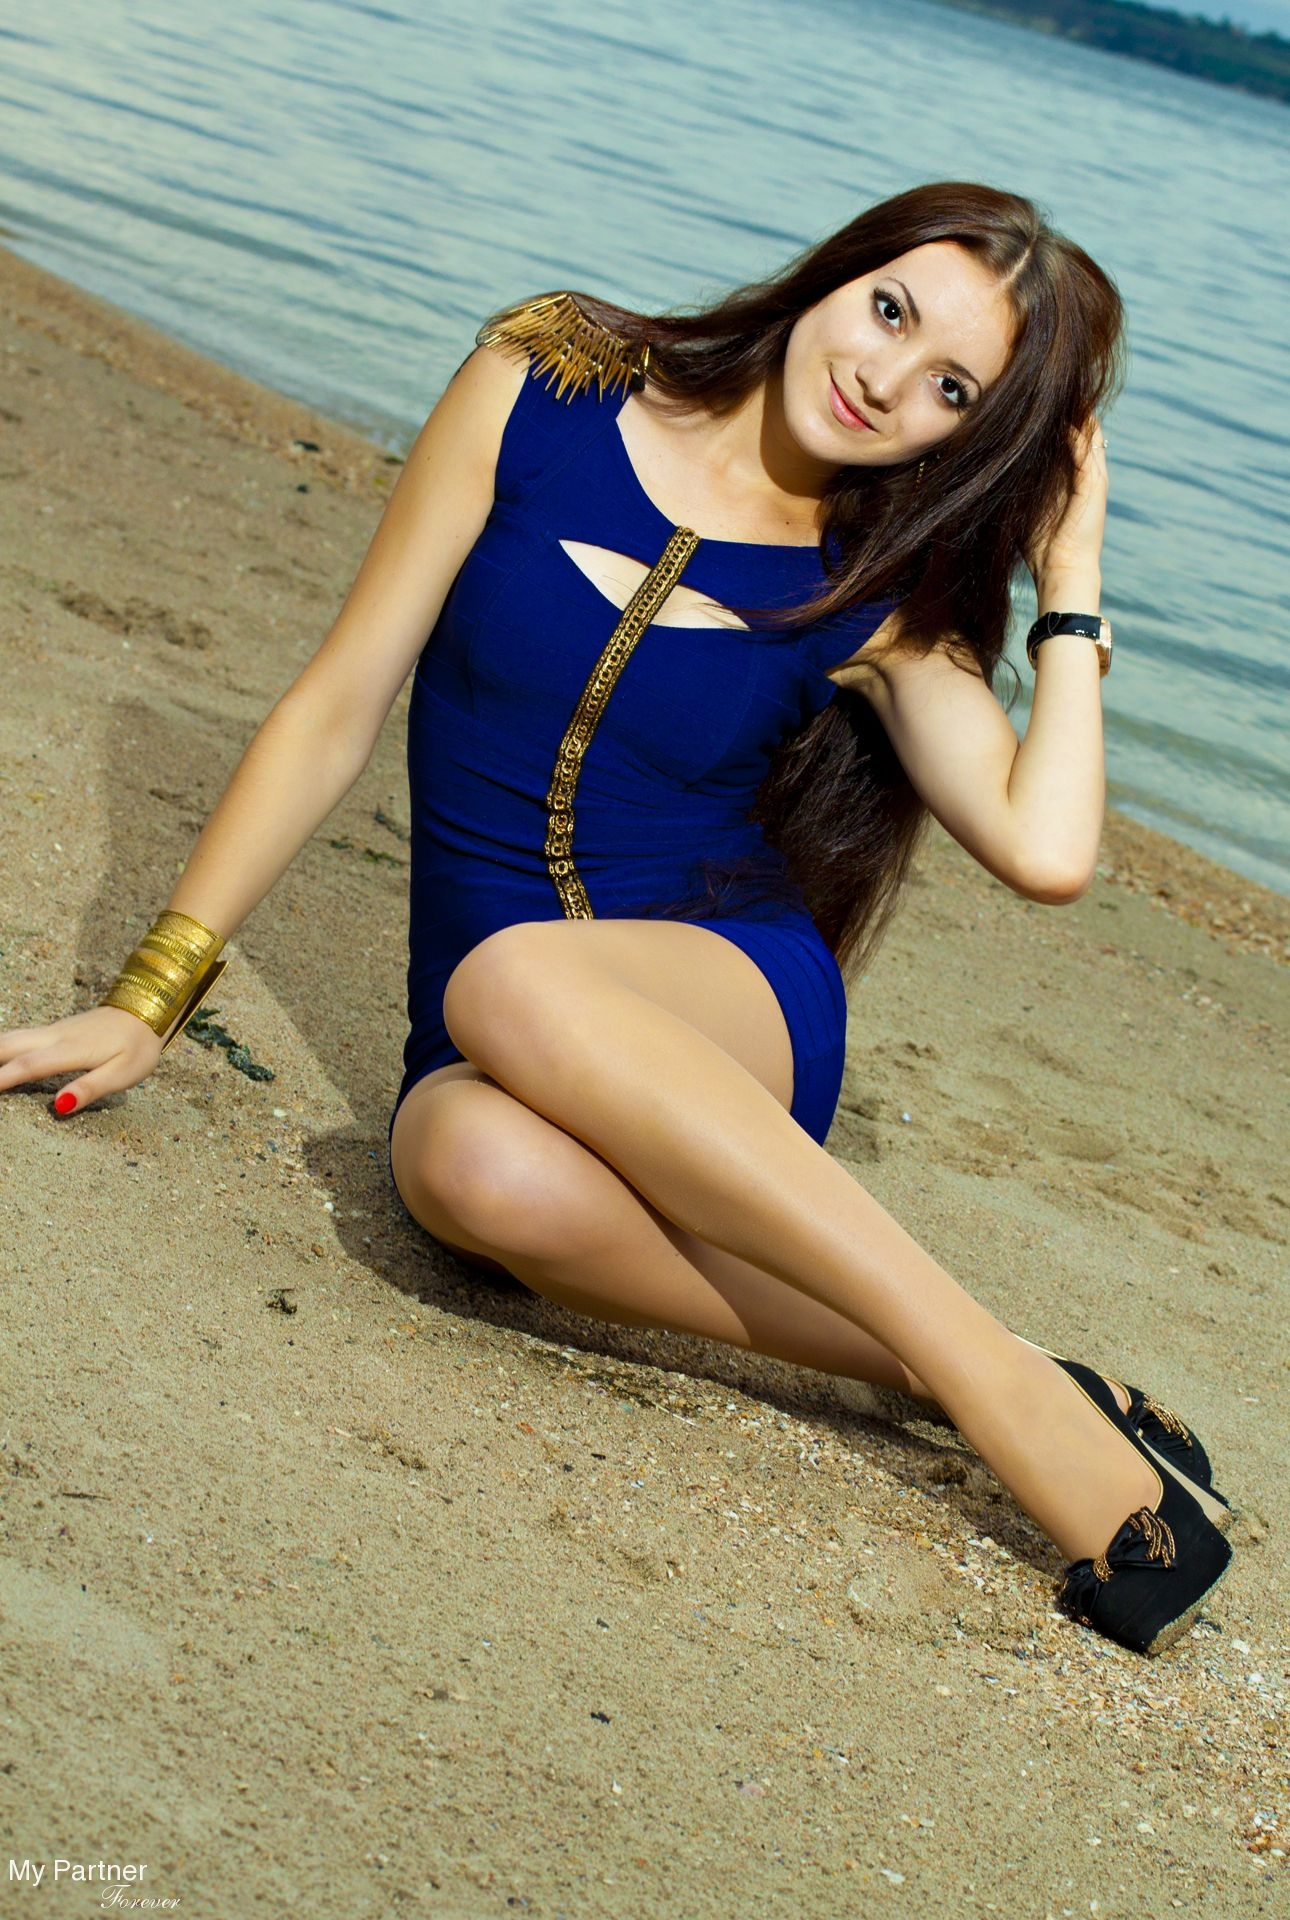 dating pattaya 100% free thai dating site international online thai dating for thai girls, thai singles.